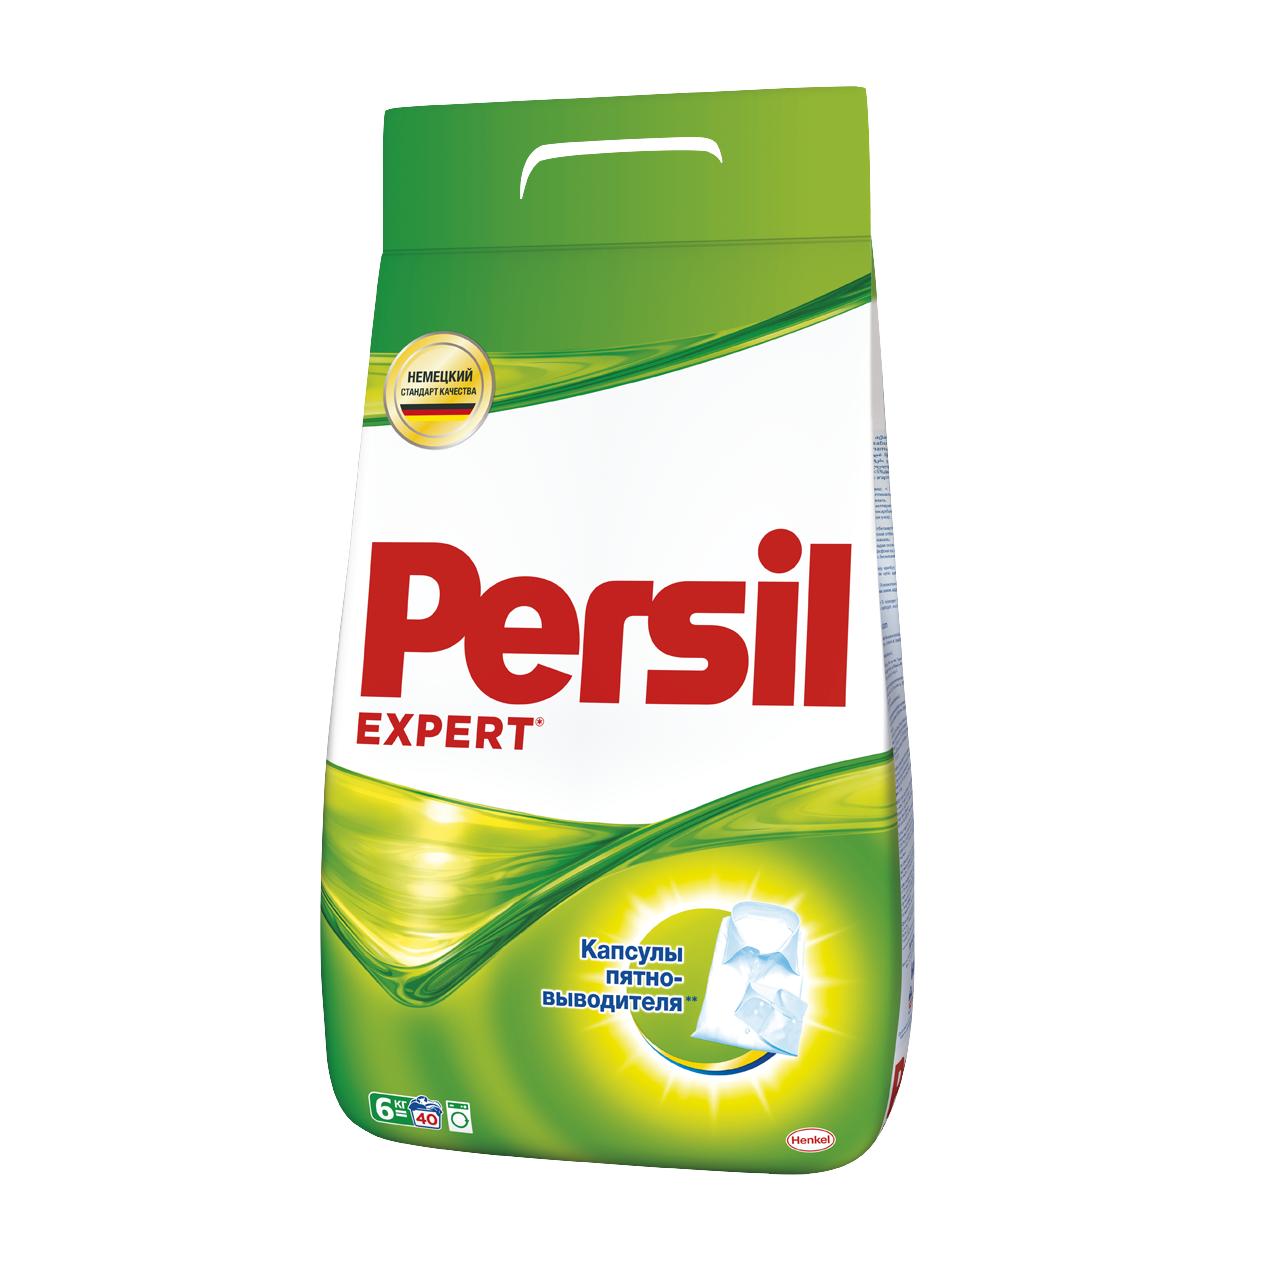 ���������� ������� Persil Expert ������� ������� 6000 ��.